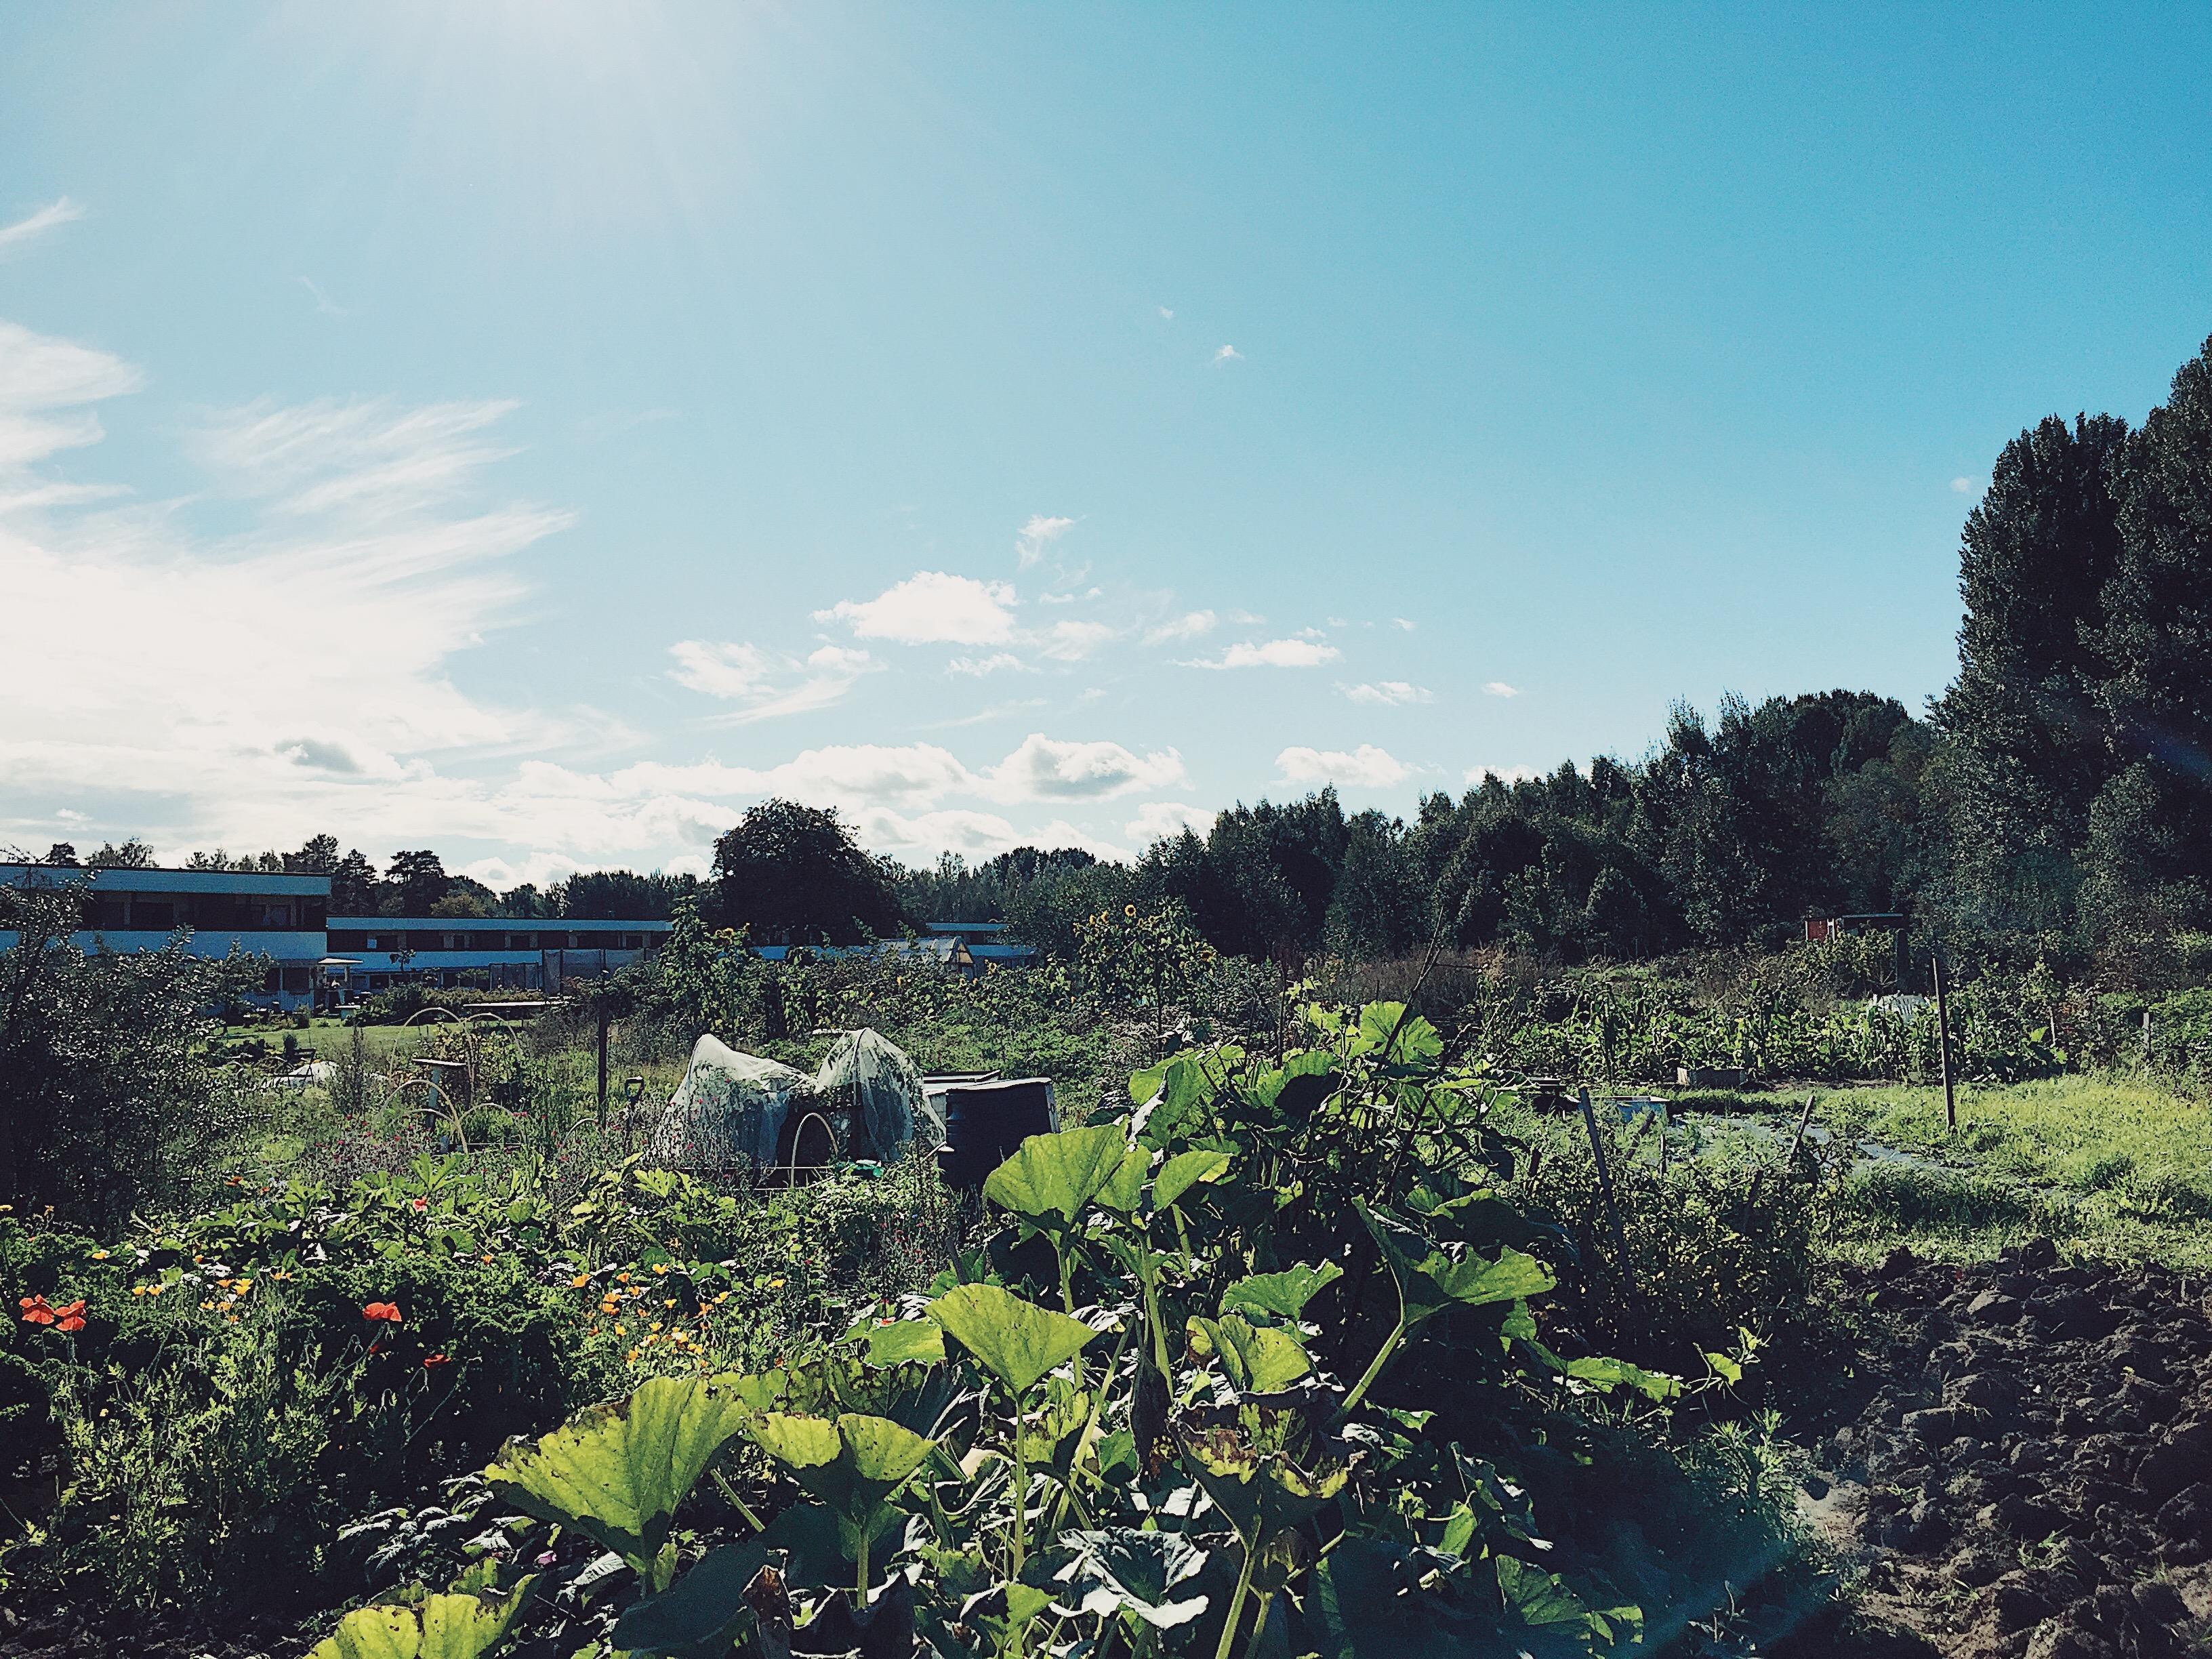 odligslott-selfsufficient-harvest-odla